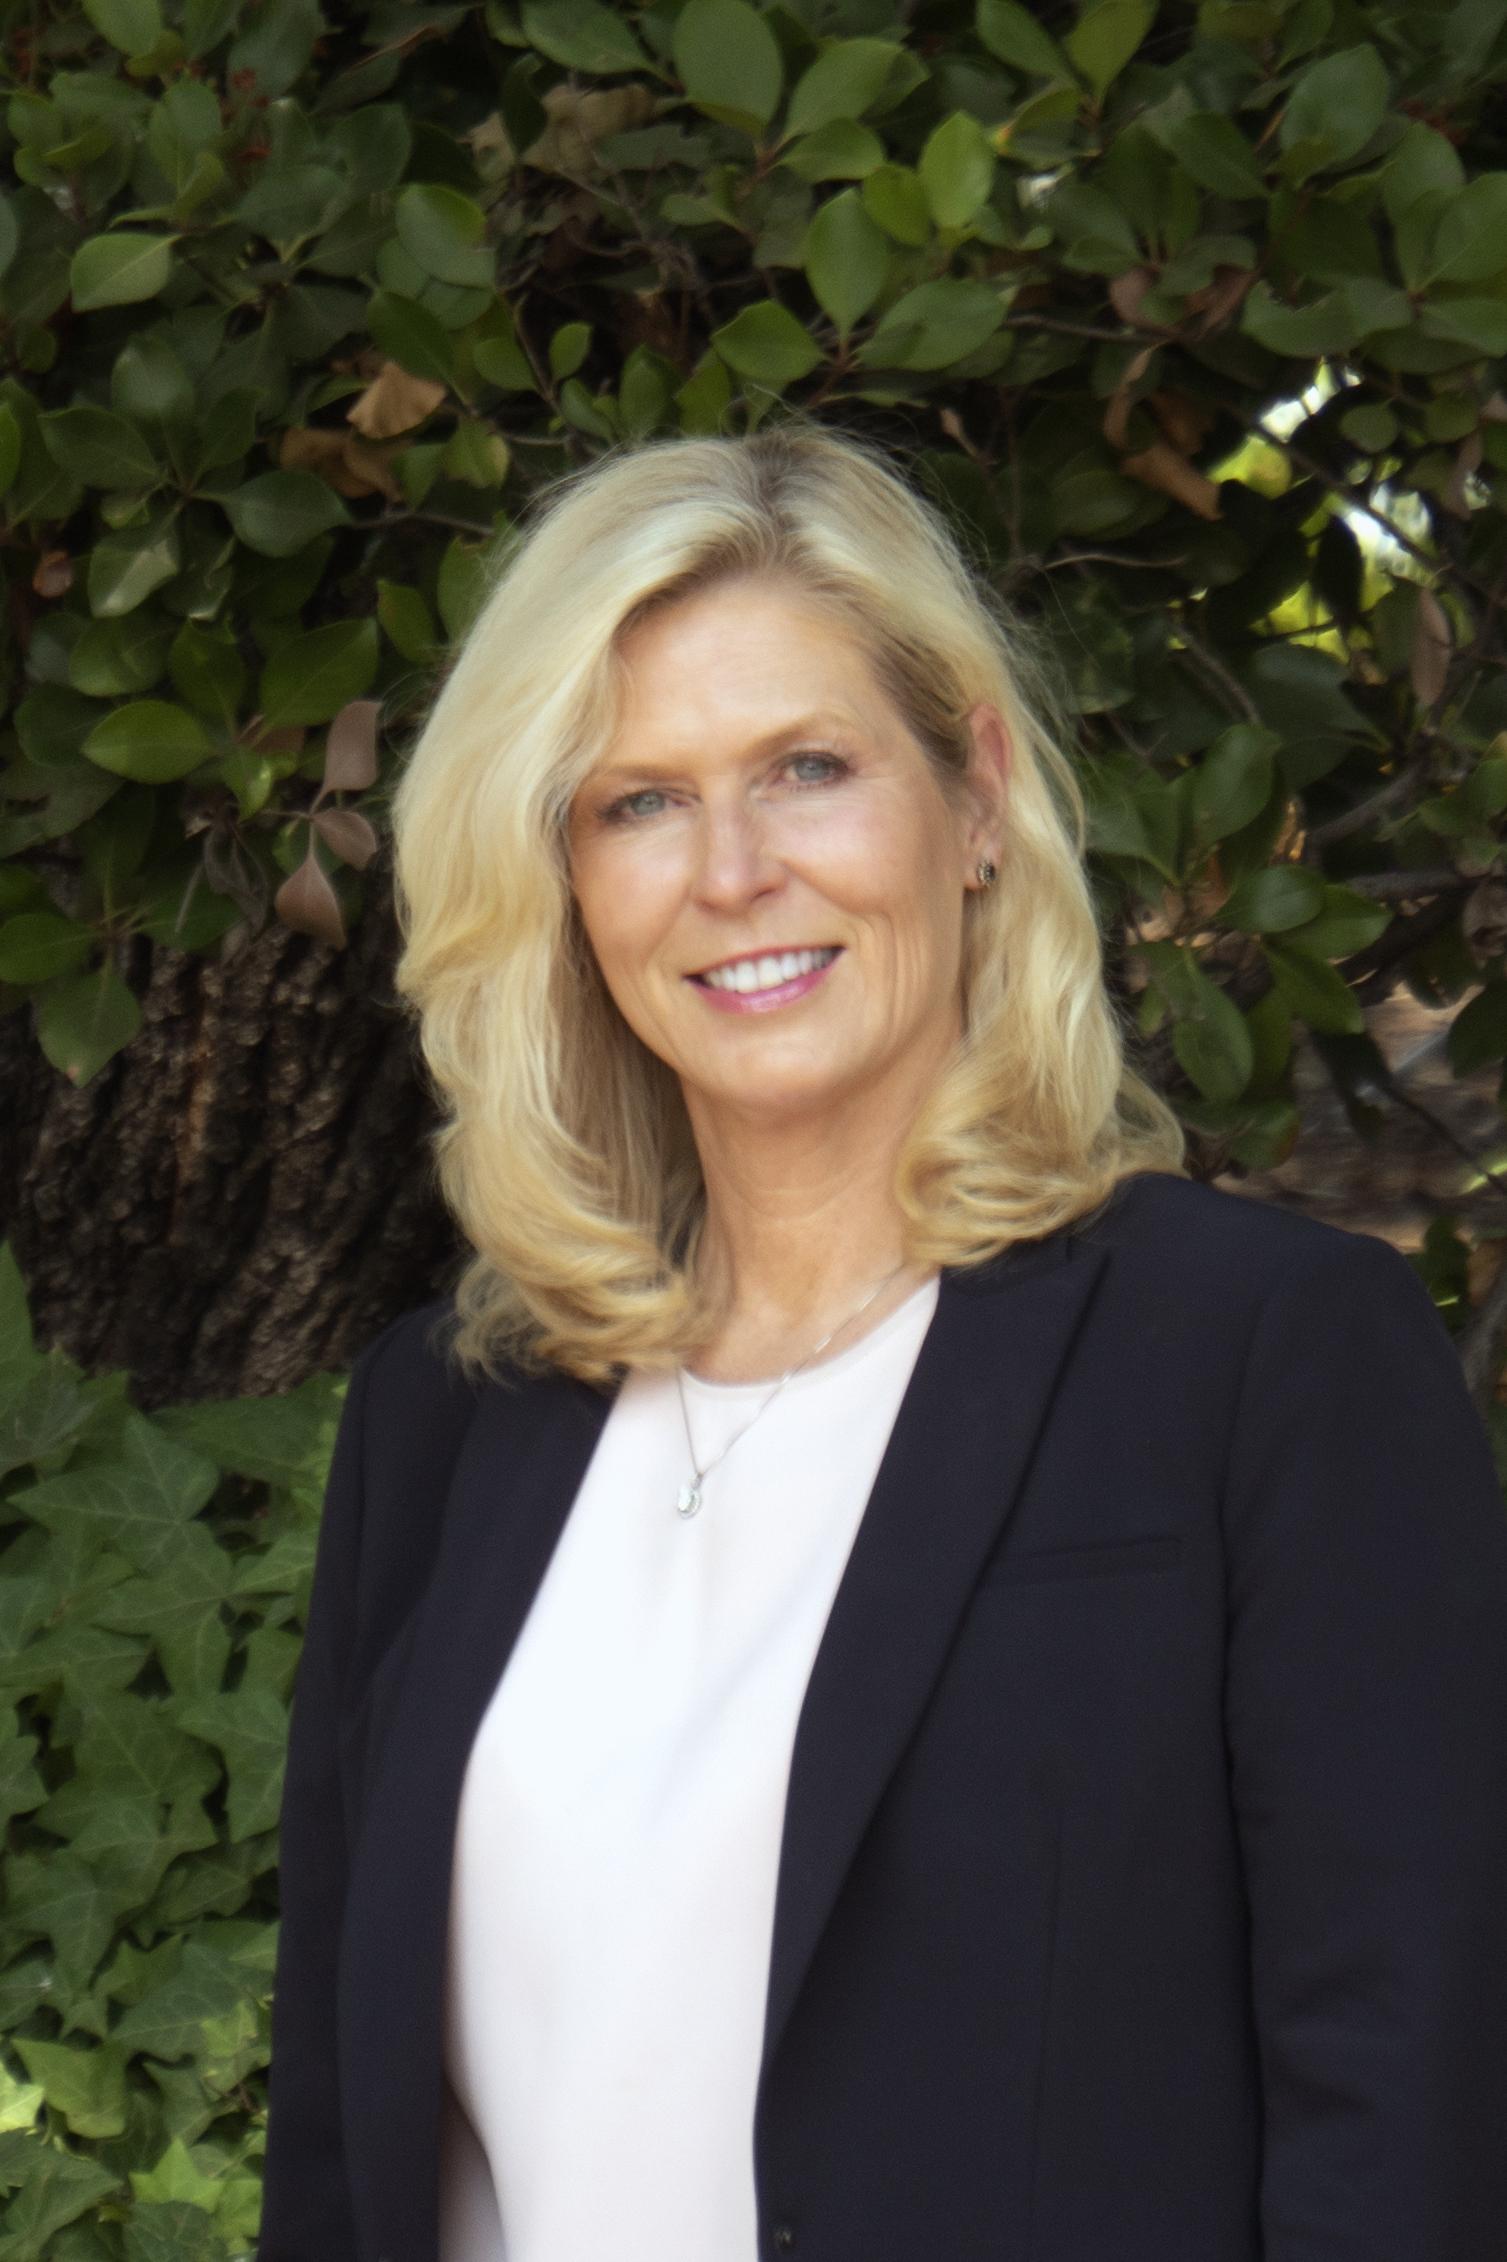 Elizabeth Bunker Griggs, President / CEO